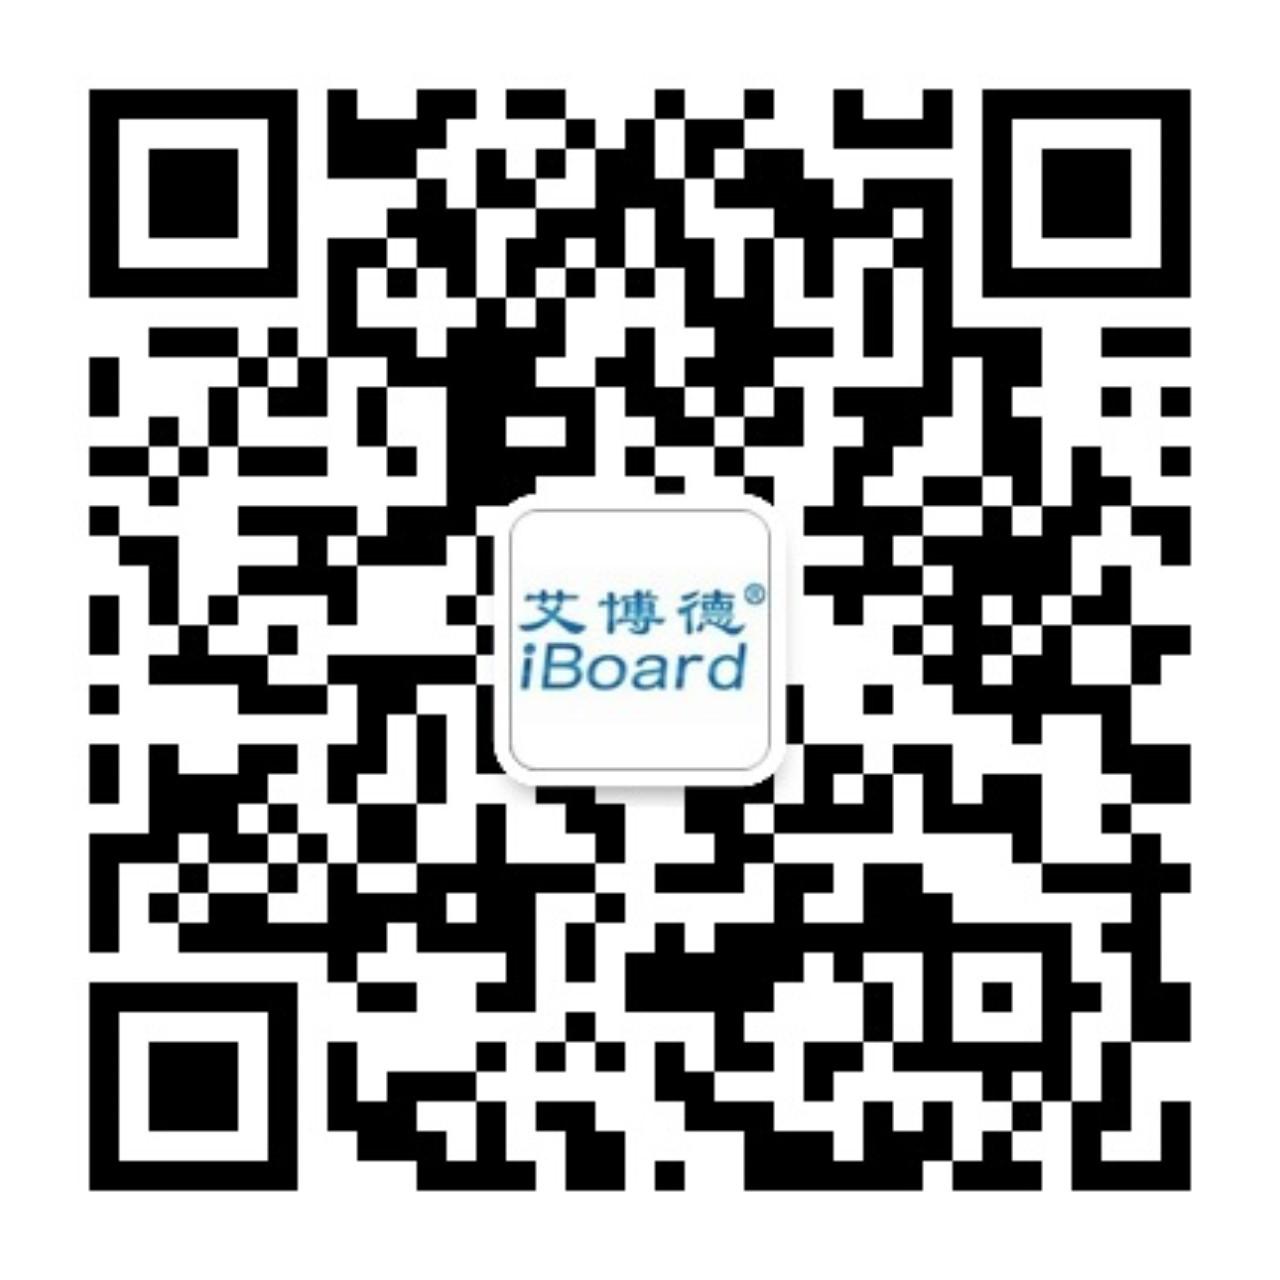 微信号:http://www.ds-360.com/upfiles/wx/2017822111057.jpg